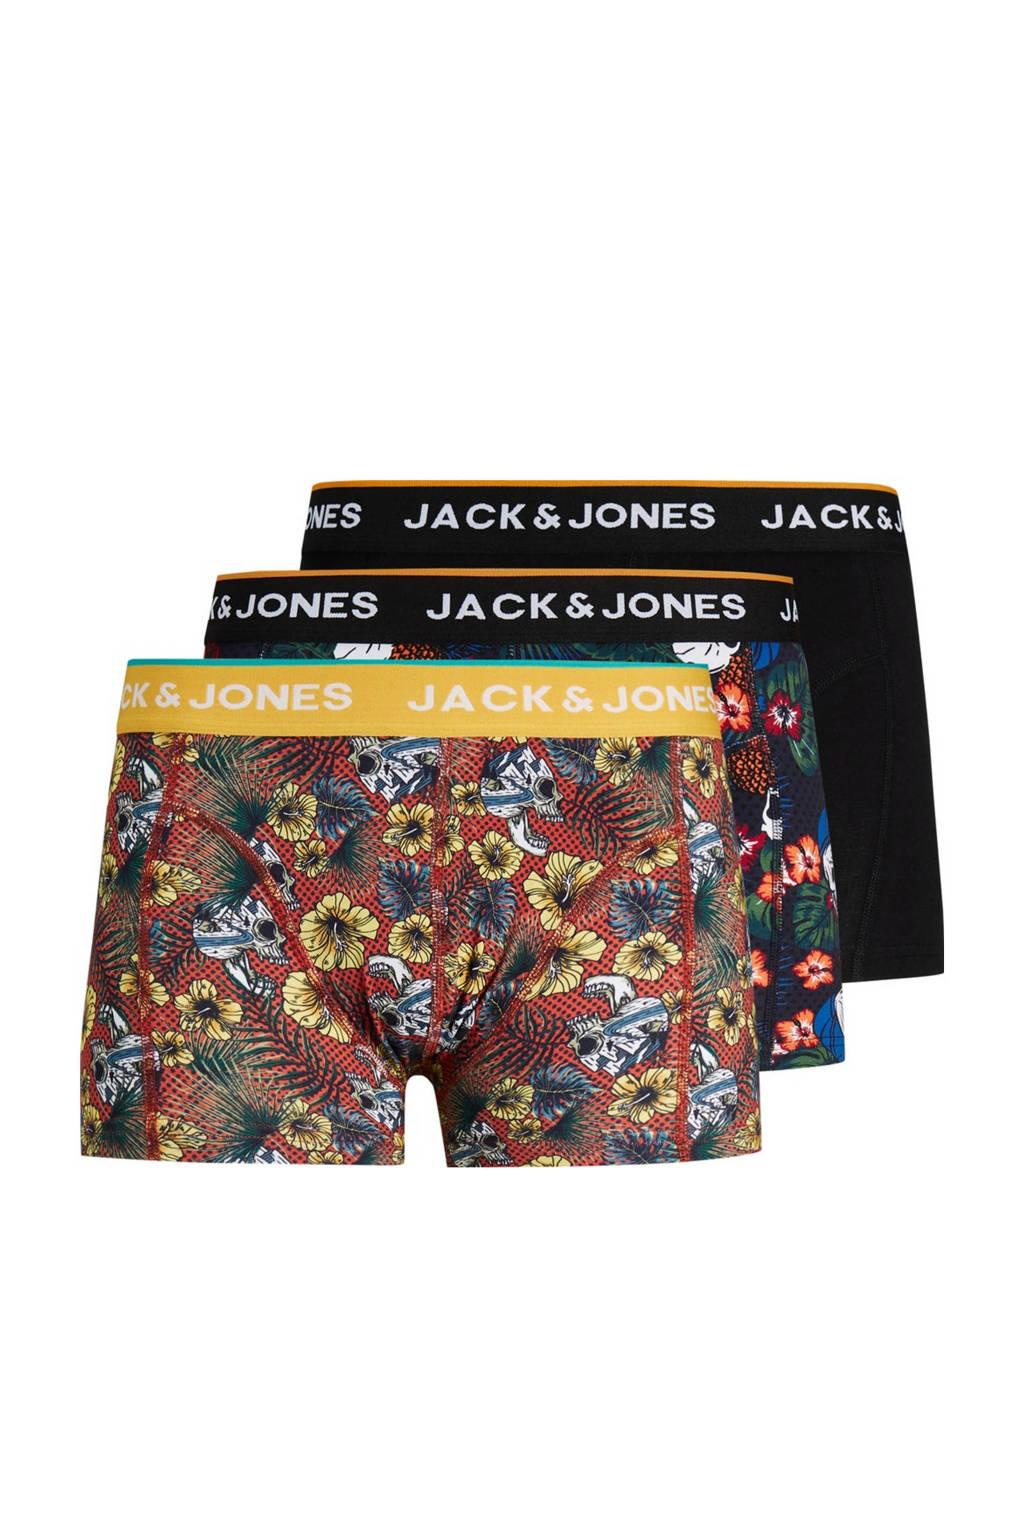 JACK & JONES boxershort JACBRAC (set van 3), Zwart/rood/geel